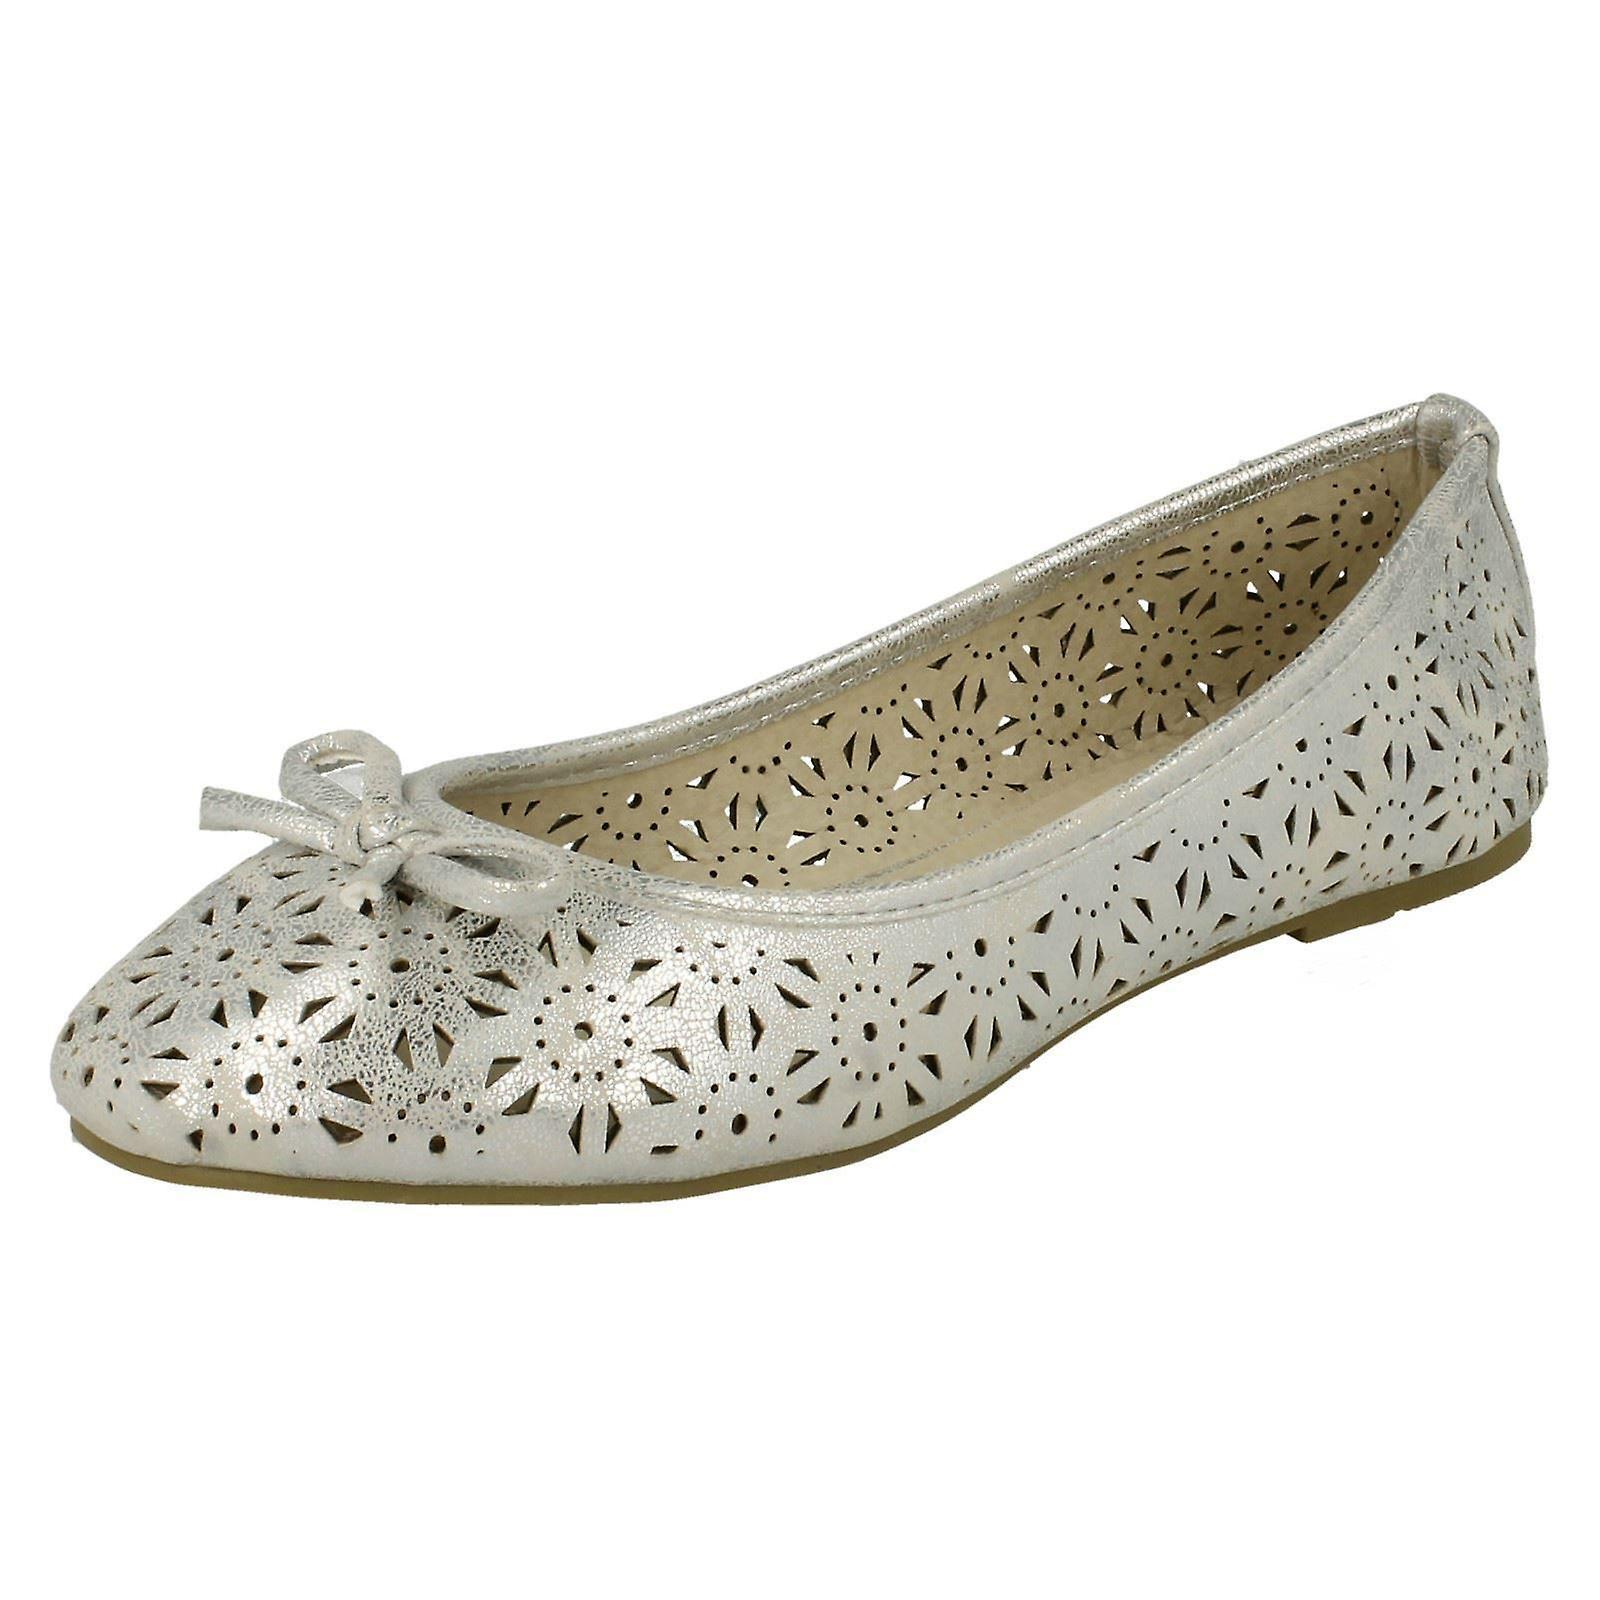 Damen-Spot auf Slip-On-Ballerina Schuhe F80037